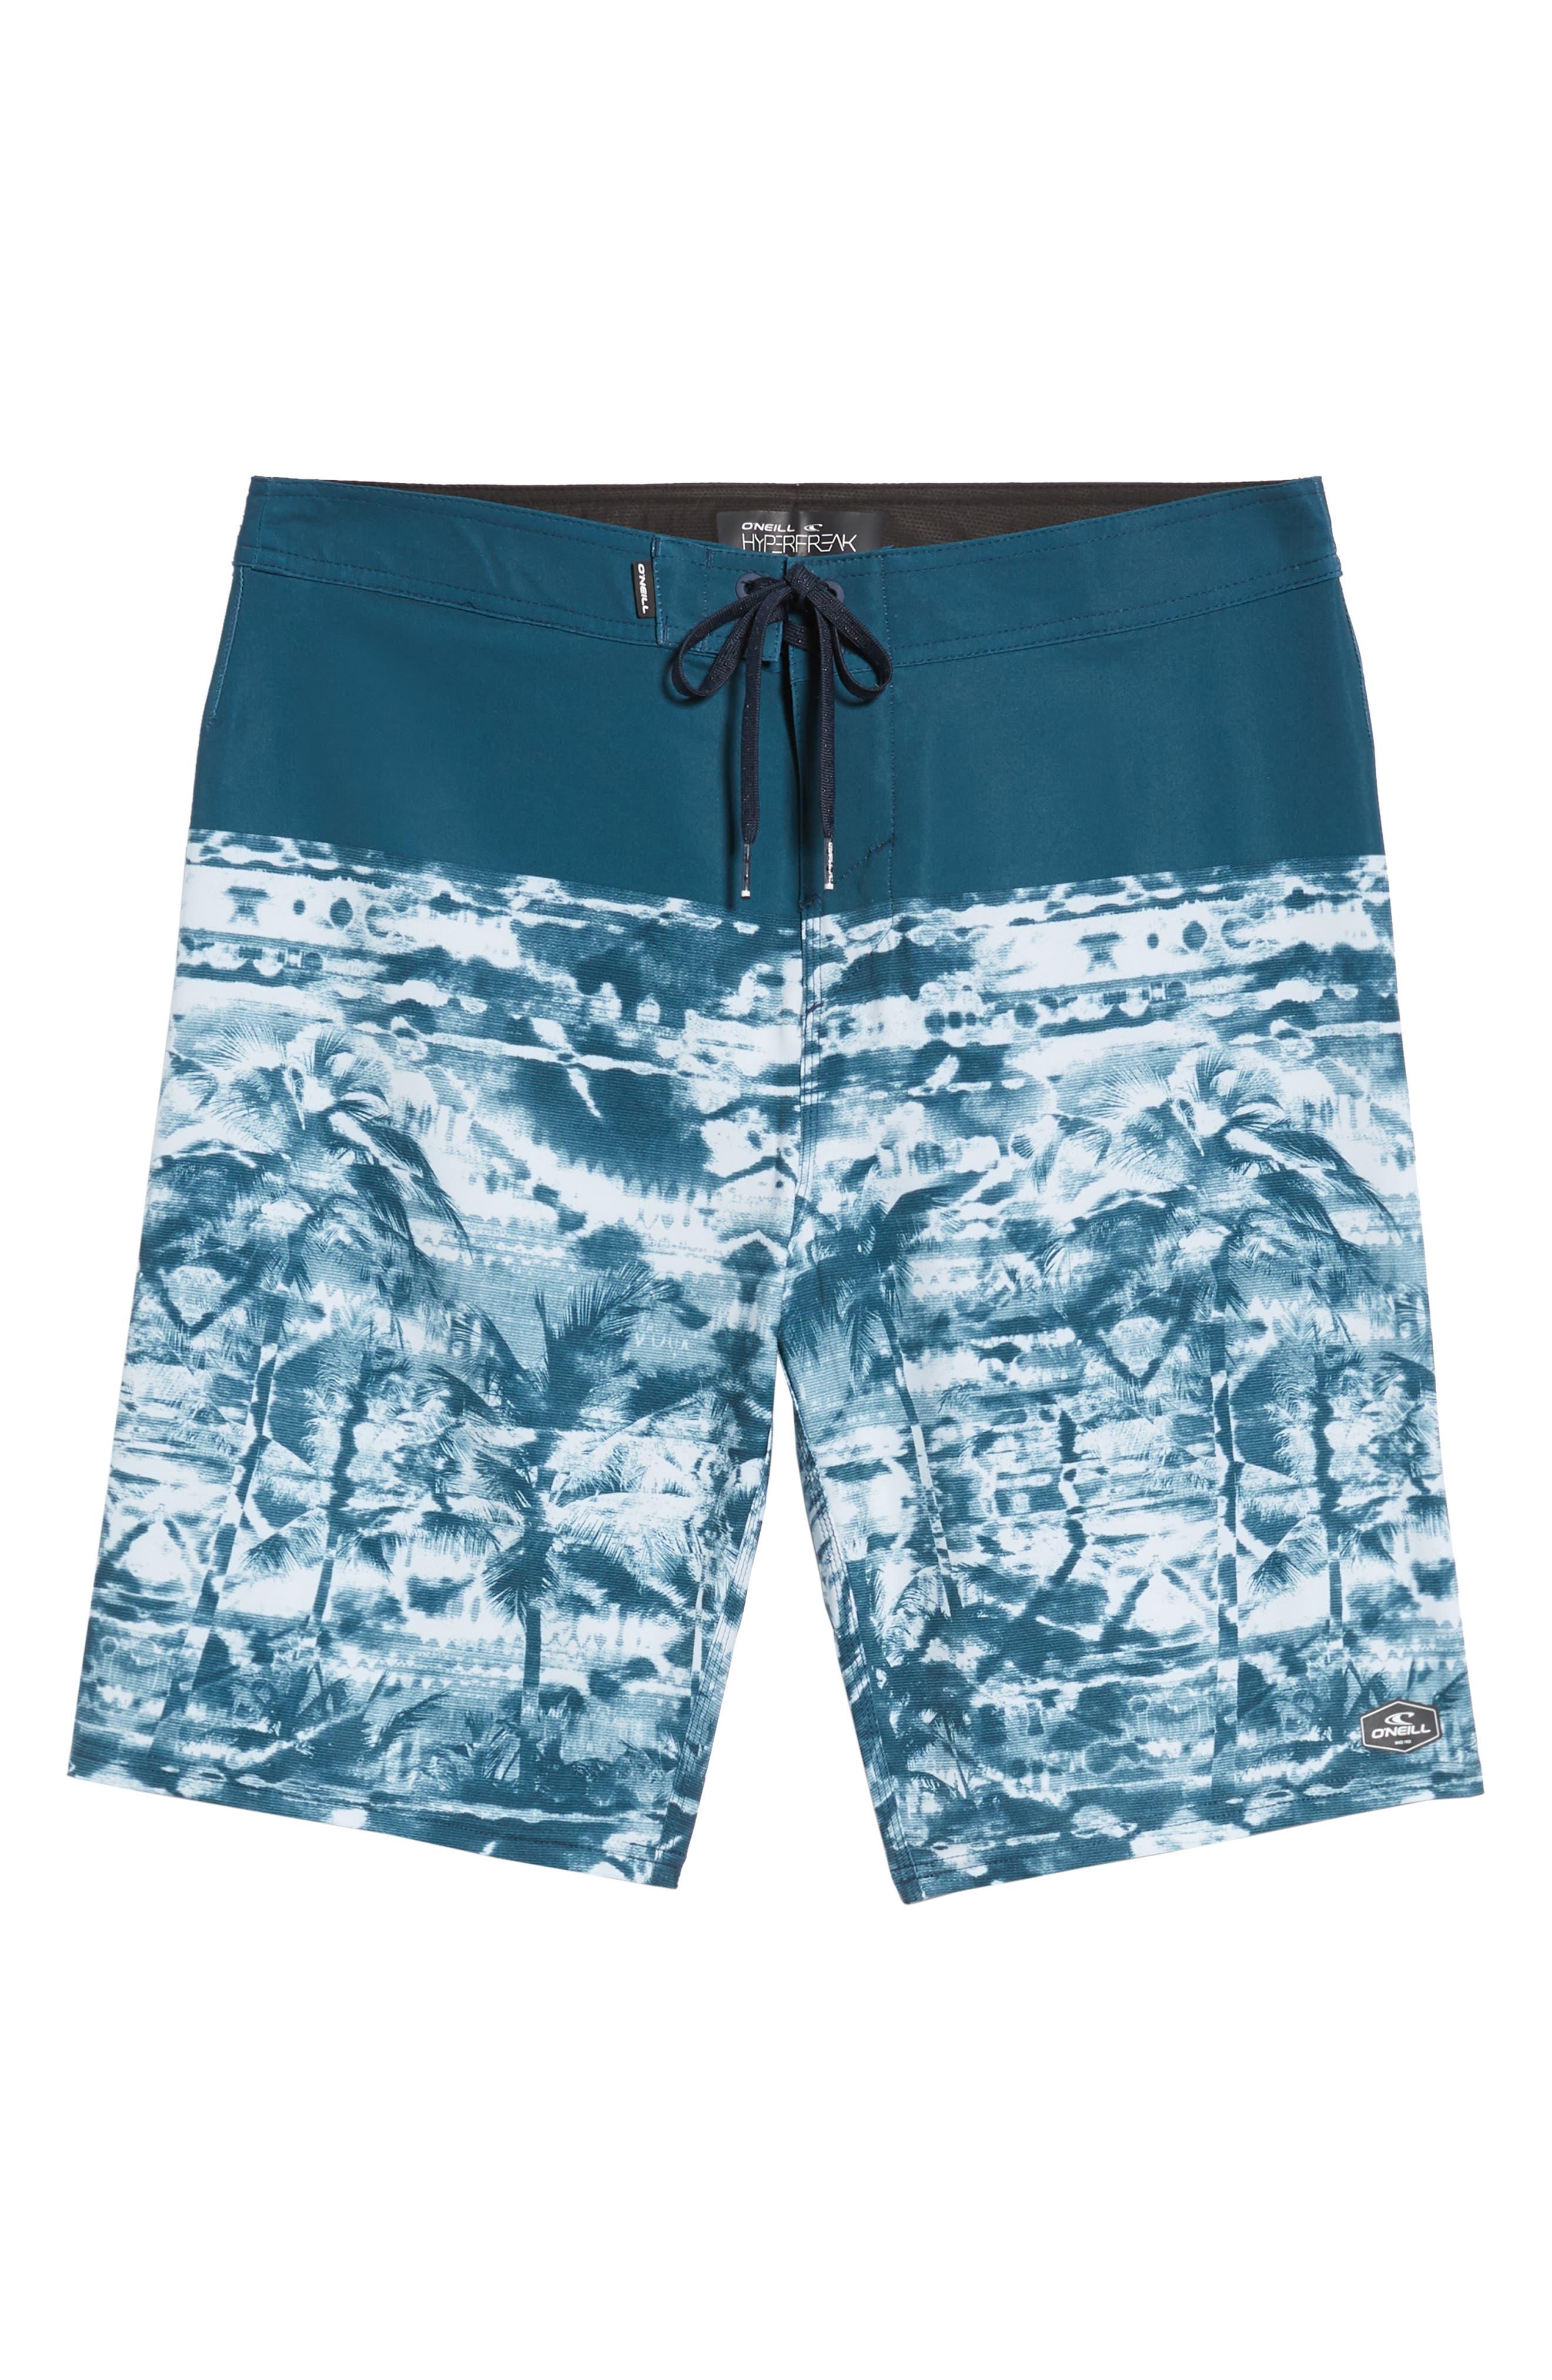 Hyperfreak Vietpalm Board Shorts,                             Alternate thumbnail 6, color,                             DARK BLUE